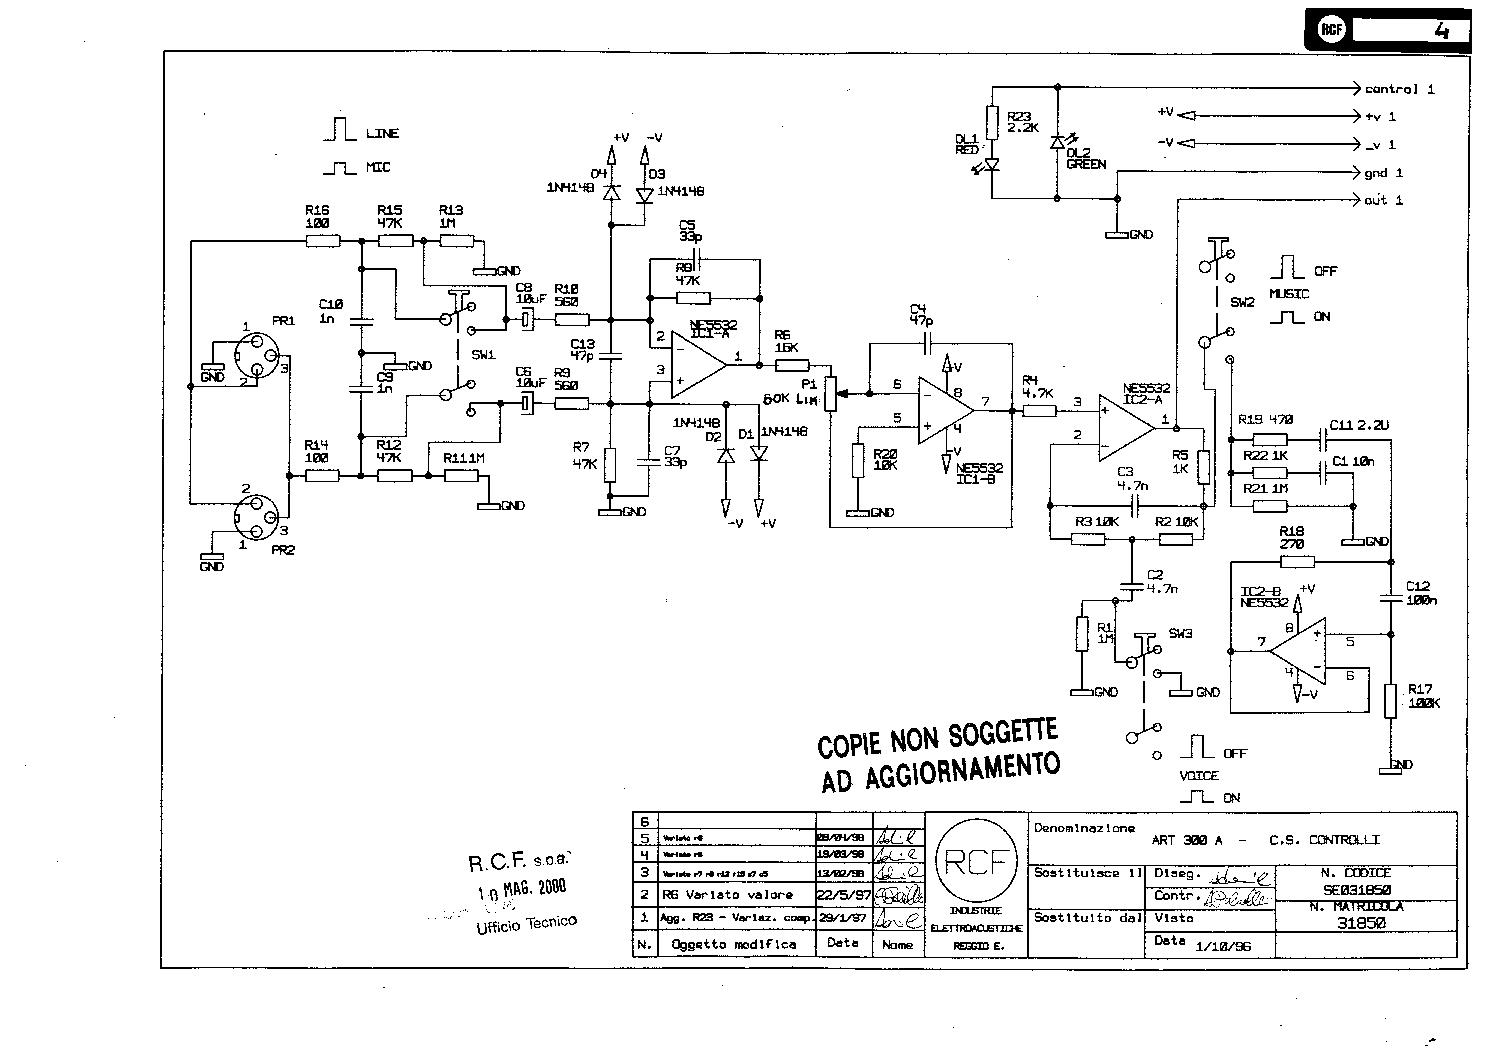 Rcf art312a se515639 a1 sch service manual download, schematics.